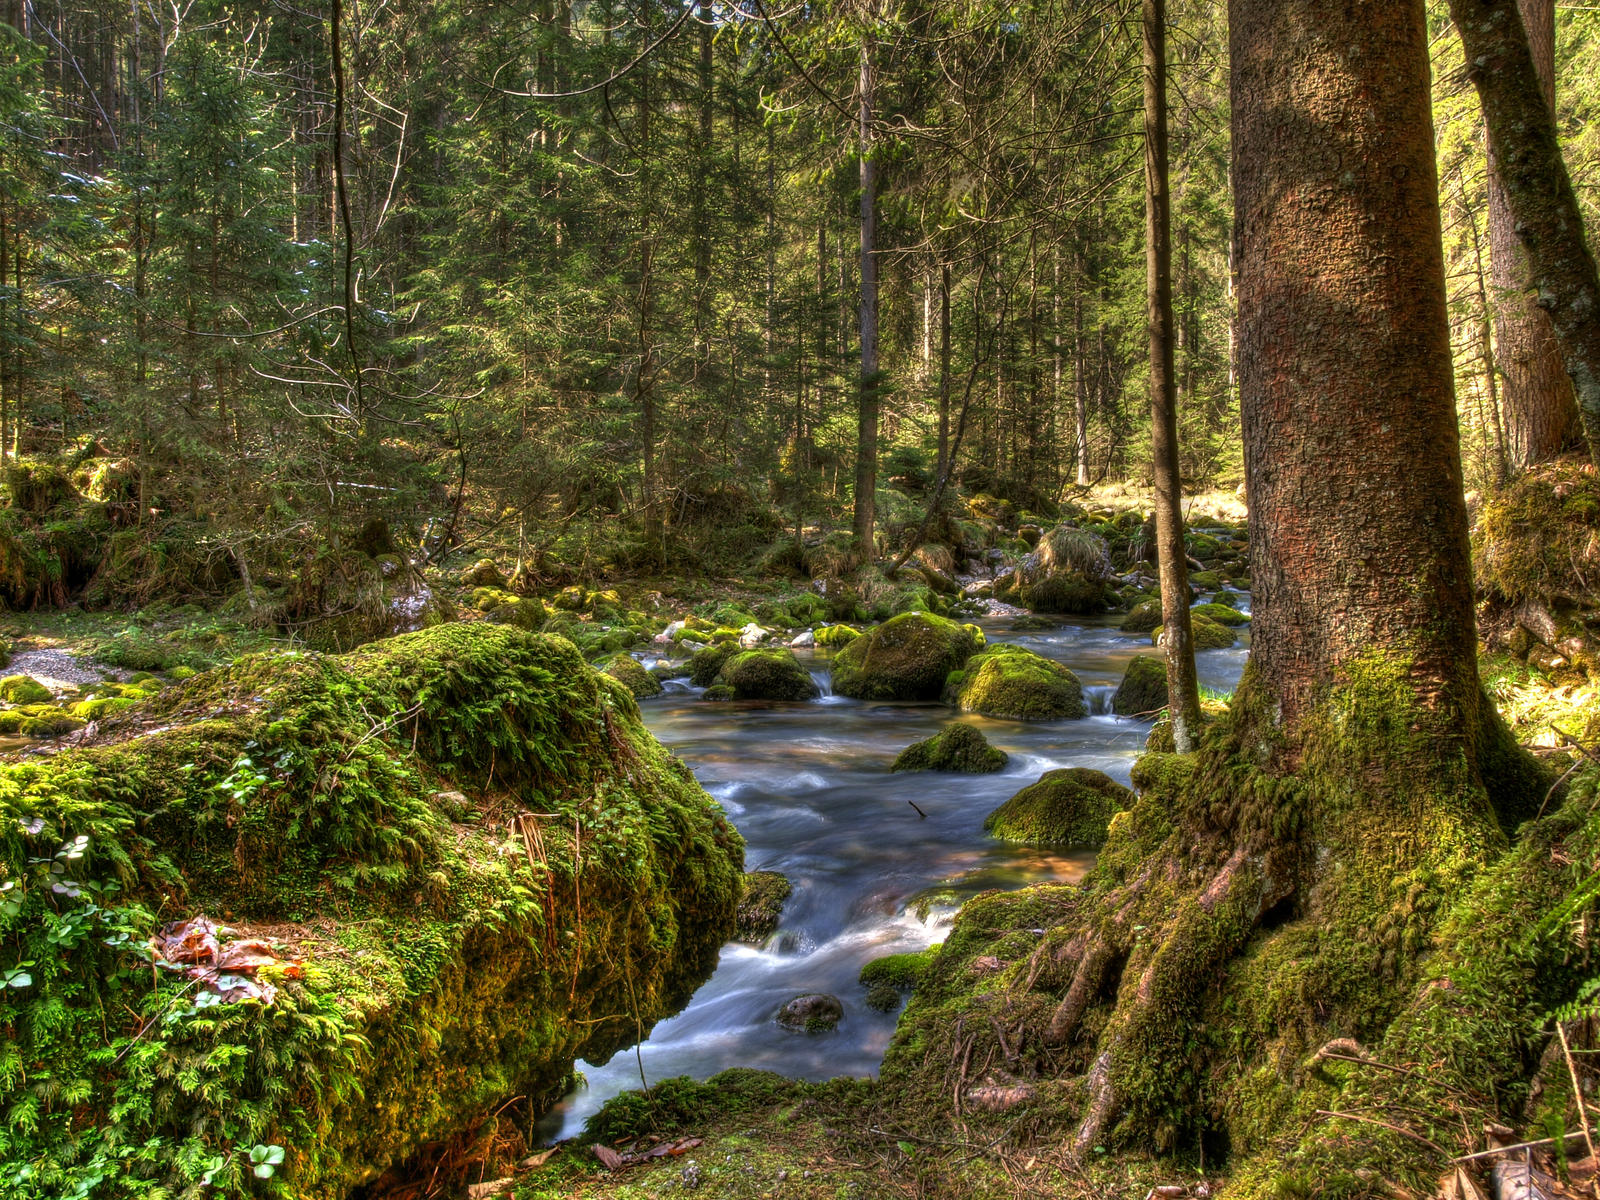 Forest Riverscape by Burtn